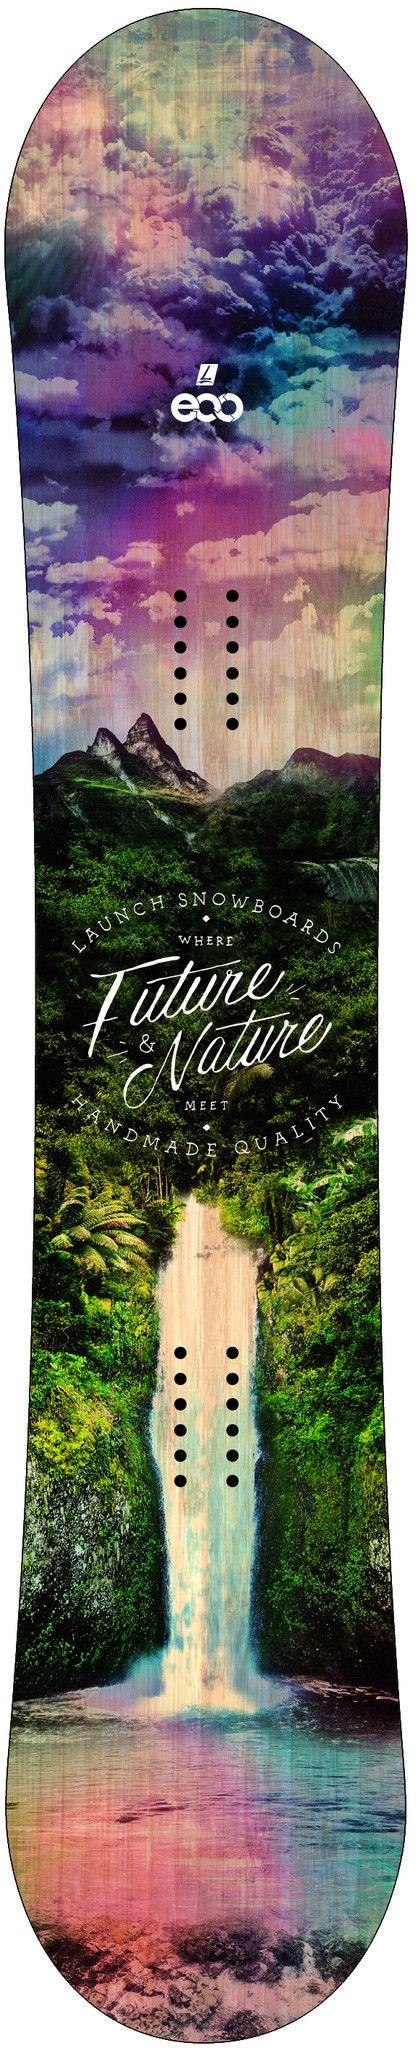 2016 Launch Eco Snowboard Topsheet